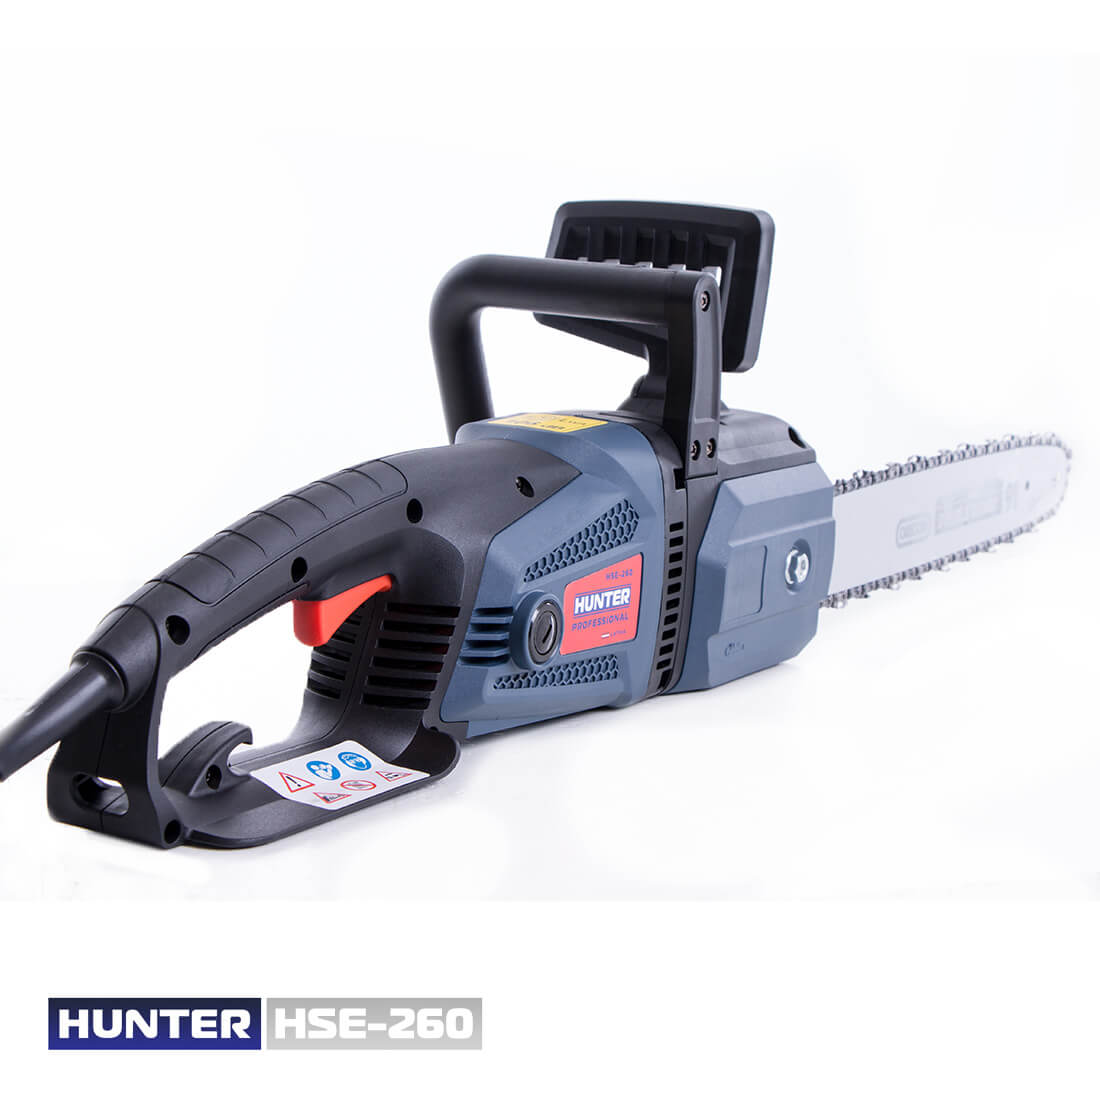 Фото Hunter HSE-280 цена 2700грн №3 — Hunter